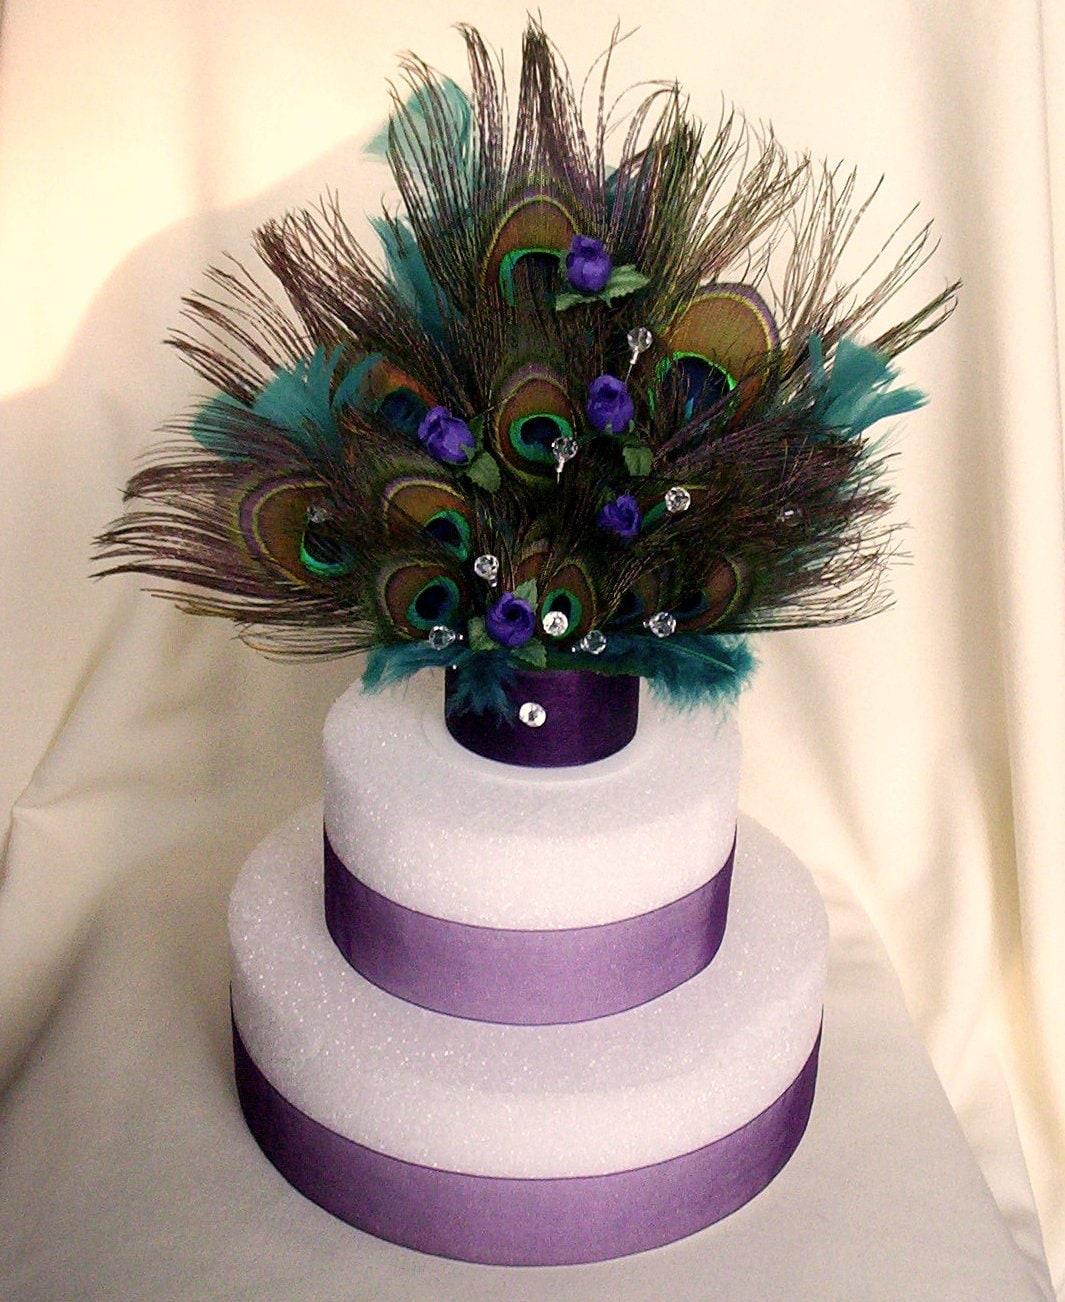 Peacock Wedding Ideas Etsy: Items Similar To Over The TOP Peacock CakeTopper Original